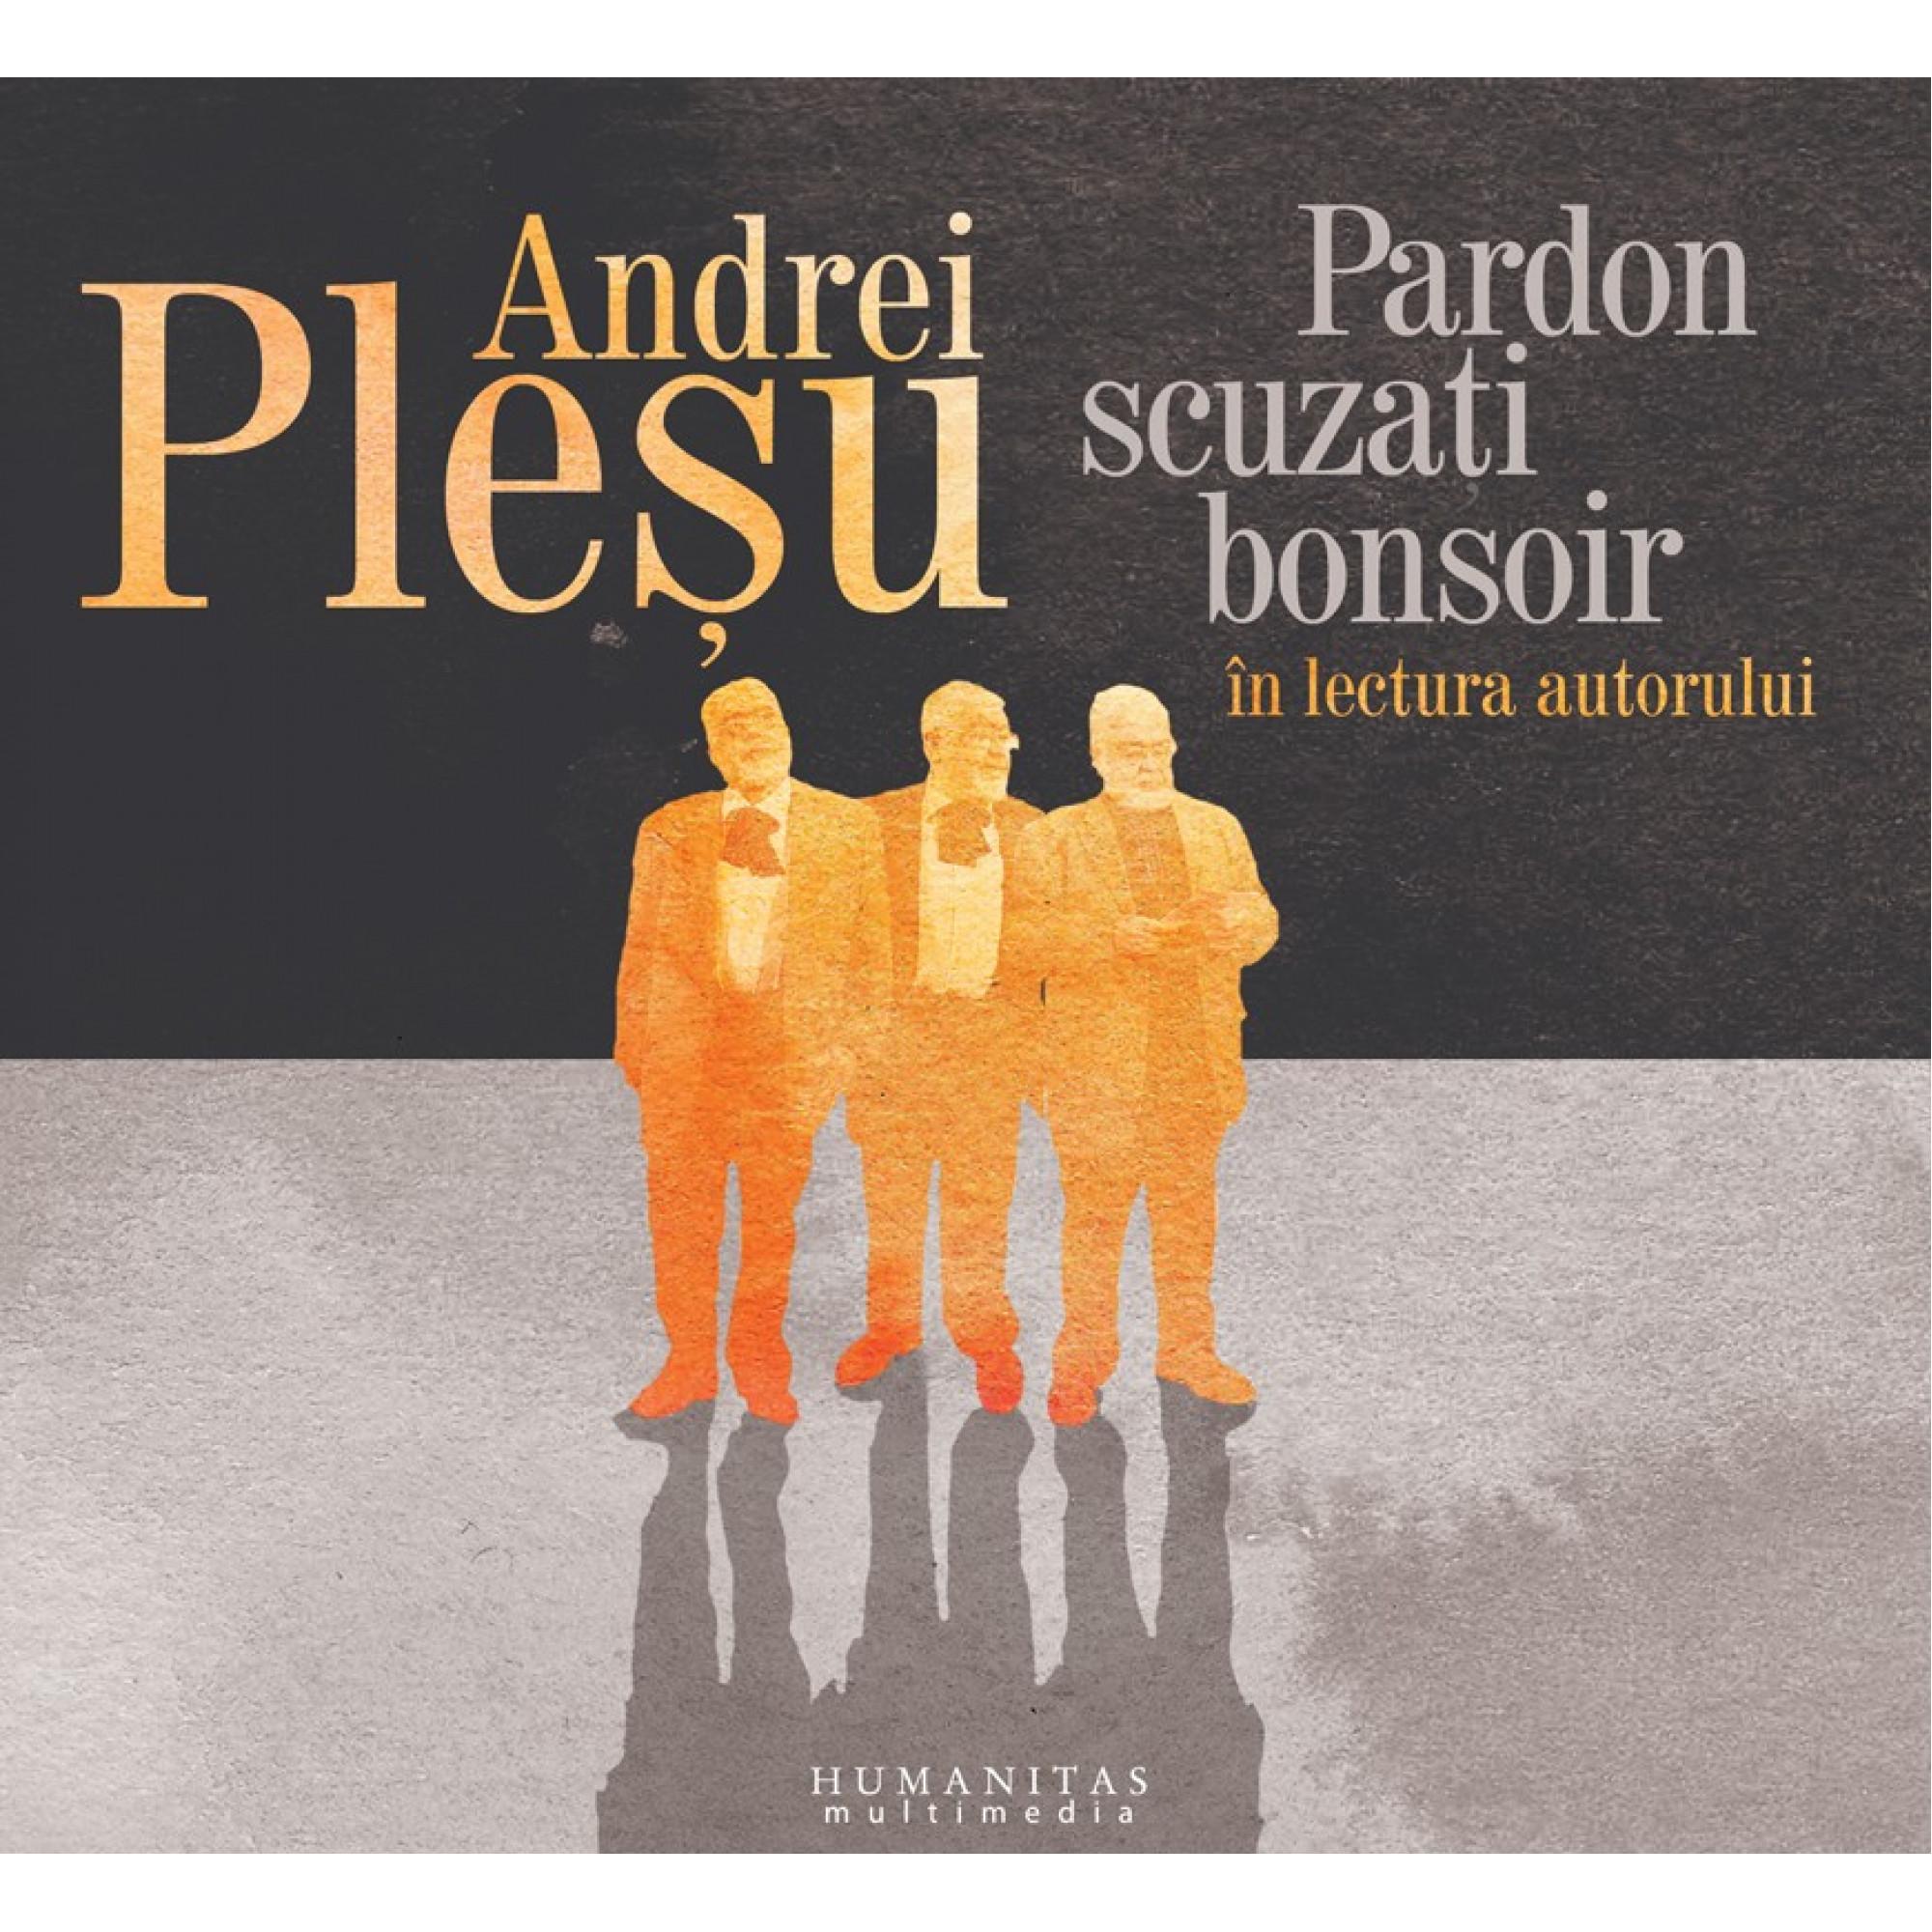 Pardon, scuzați, bonsoir; Andrei Pleșu